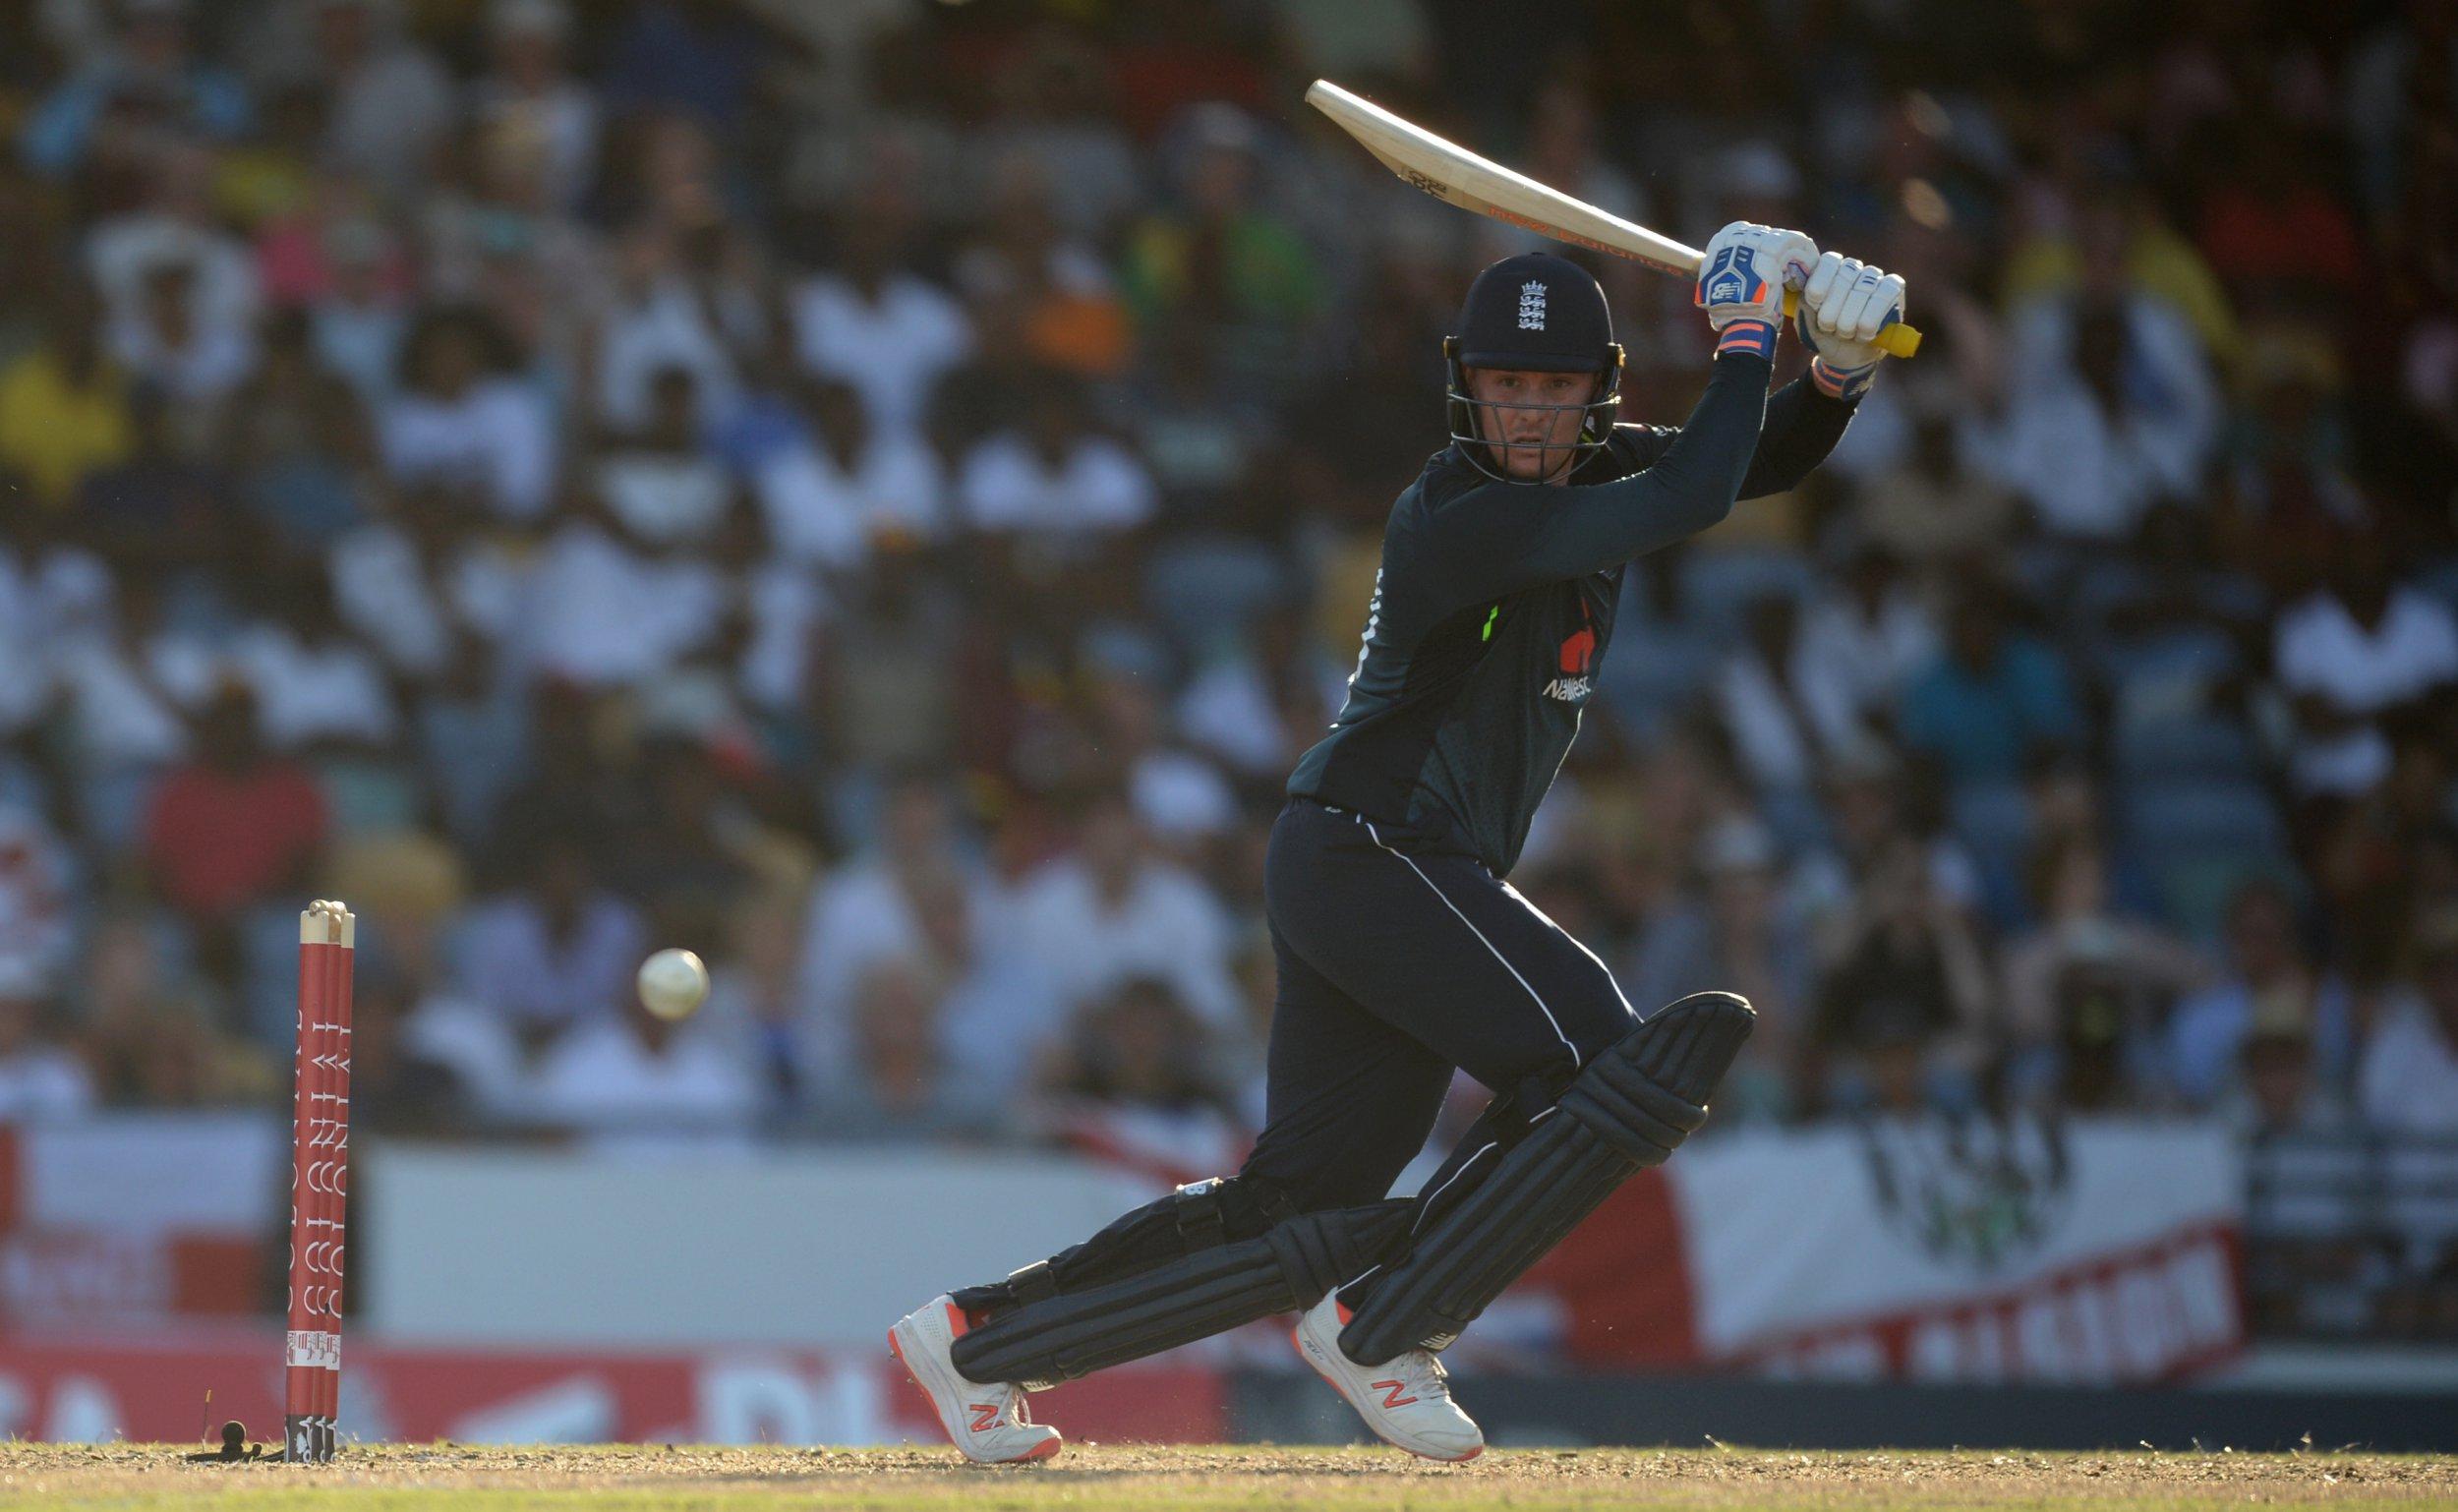 England star Jason Roy backed to emulate Australia opener David Warner after stunning West Indies victory